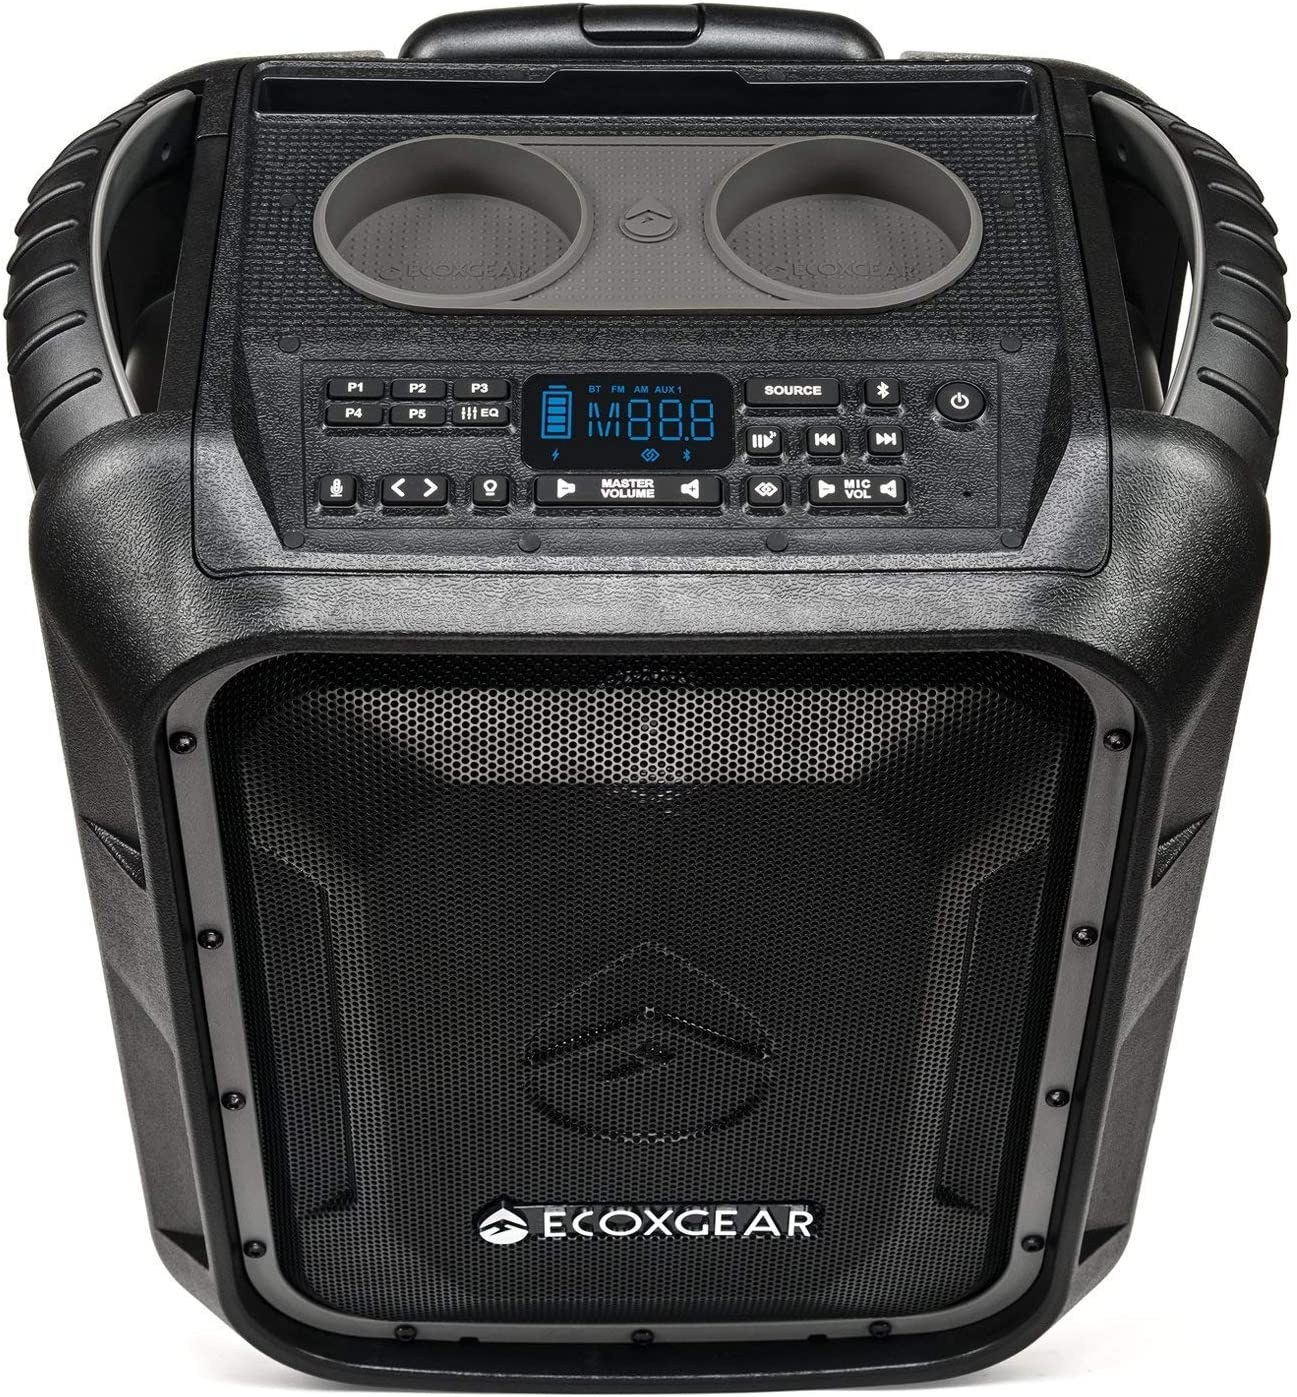 ECOXGEAR EcoBoulder+ GDI-EXBLD8 Rugged Waterproof Floating Portable  Bluetooth Wireless 8 Watt Speaker and PA System (Gray)